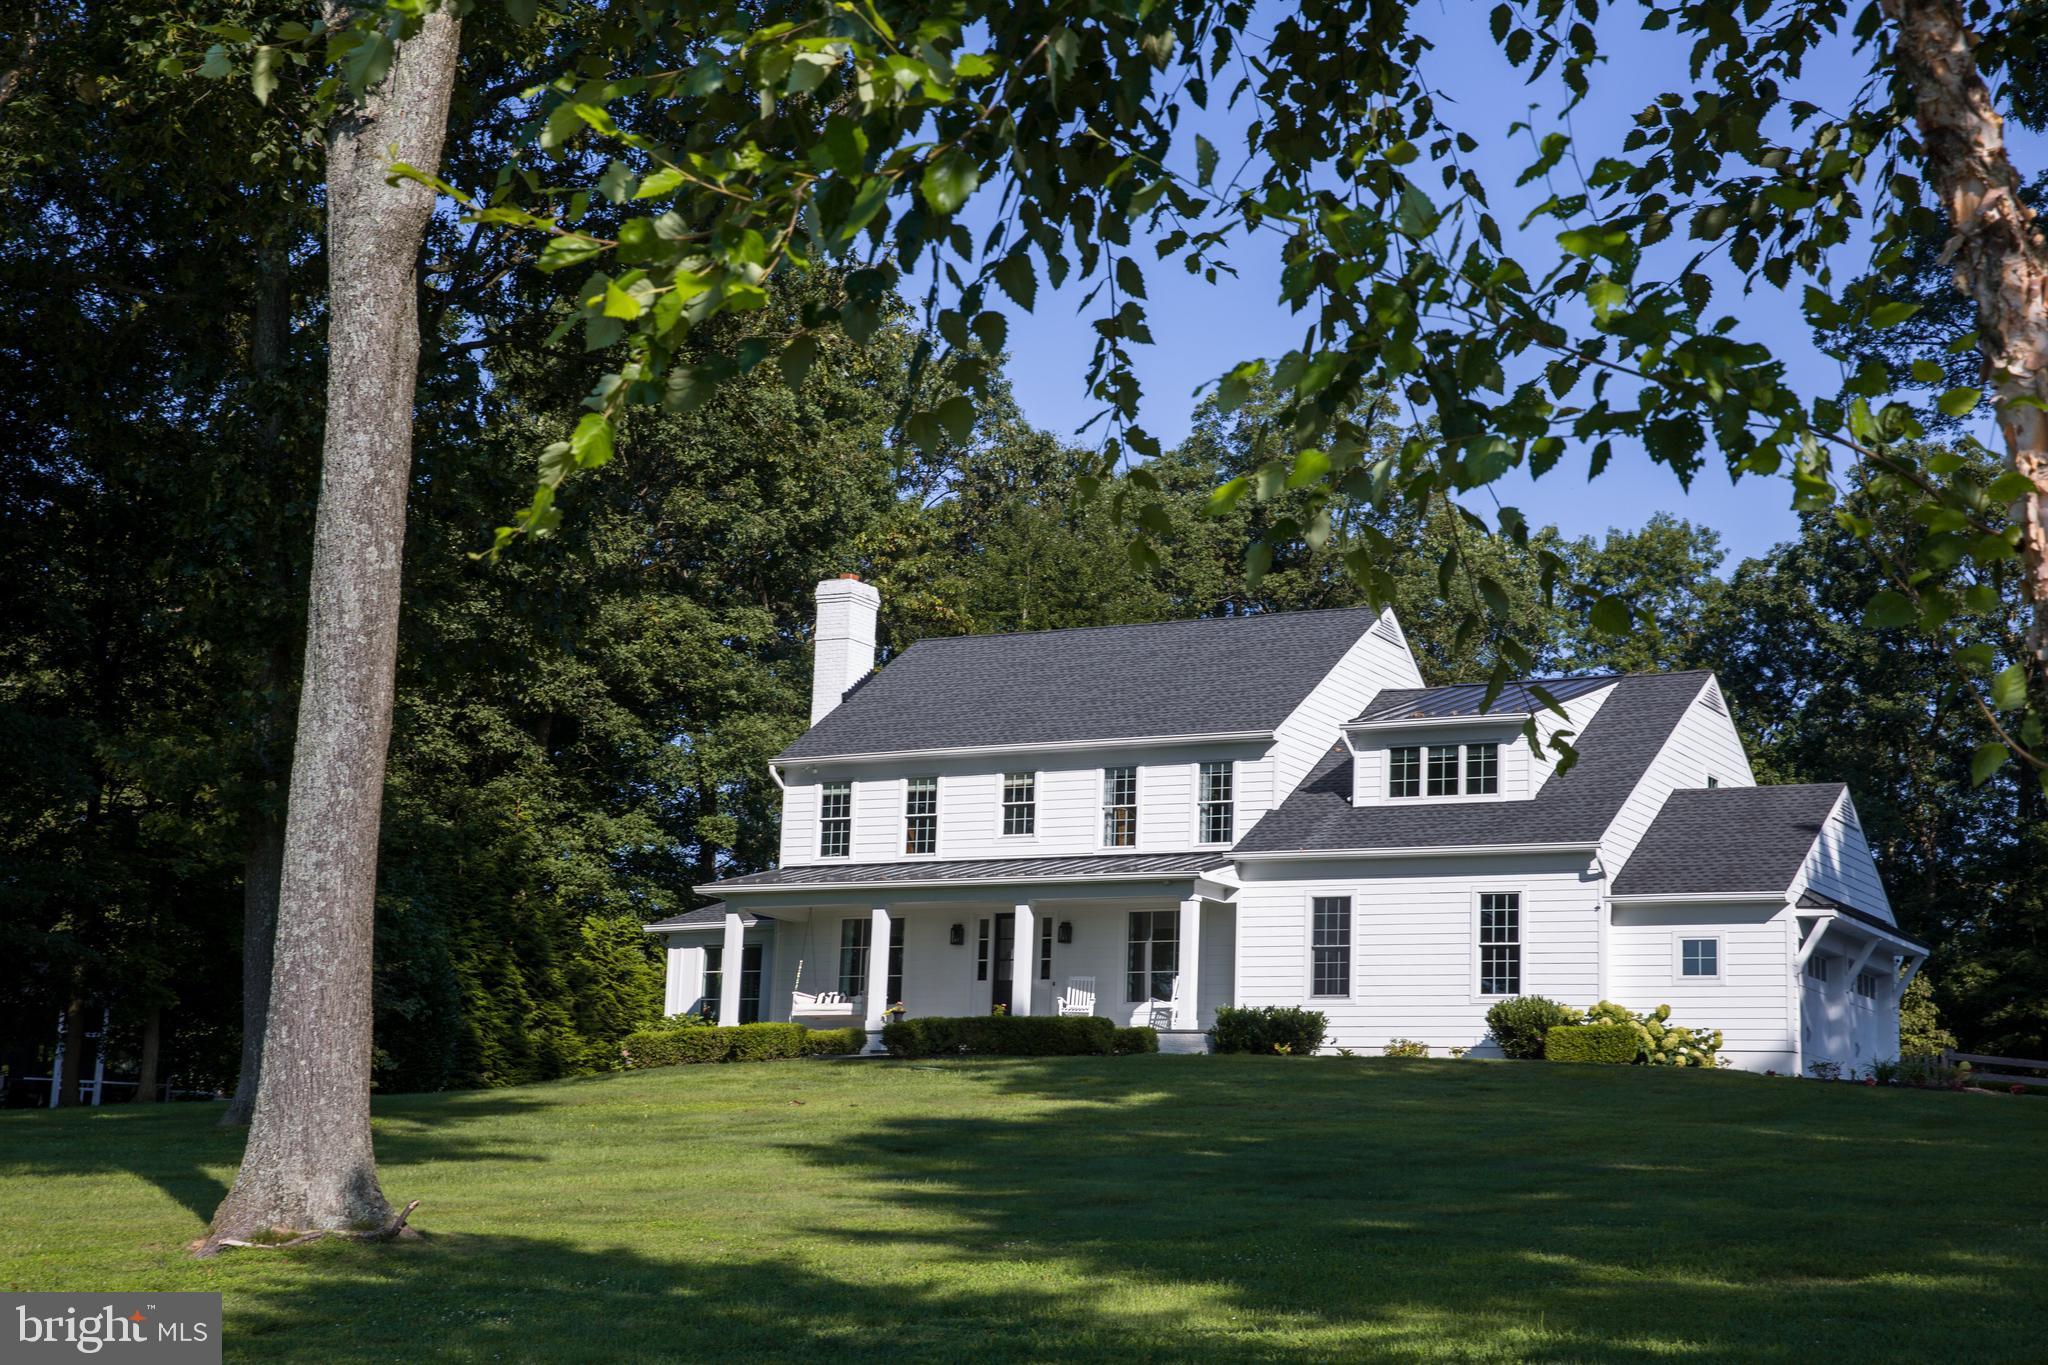 123 GRAYSTONE FARM ROAD, WHITE HALL, MD 21161